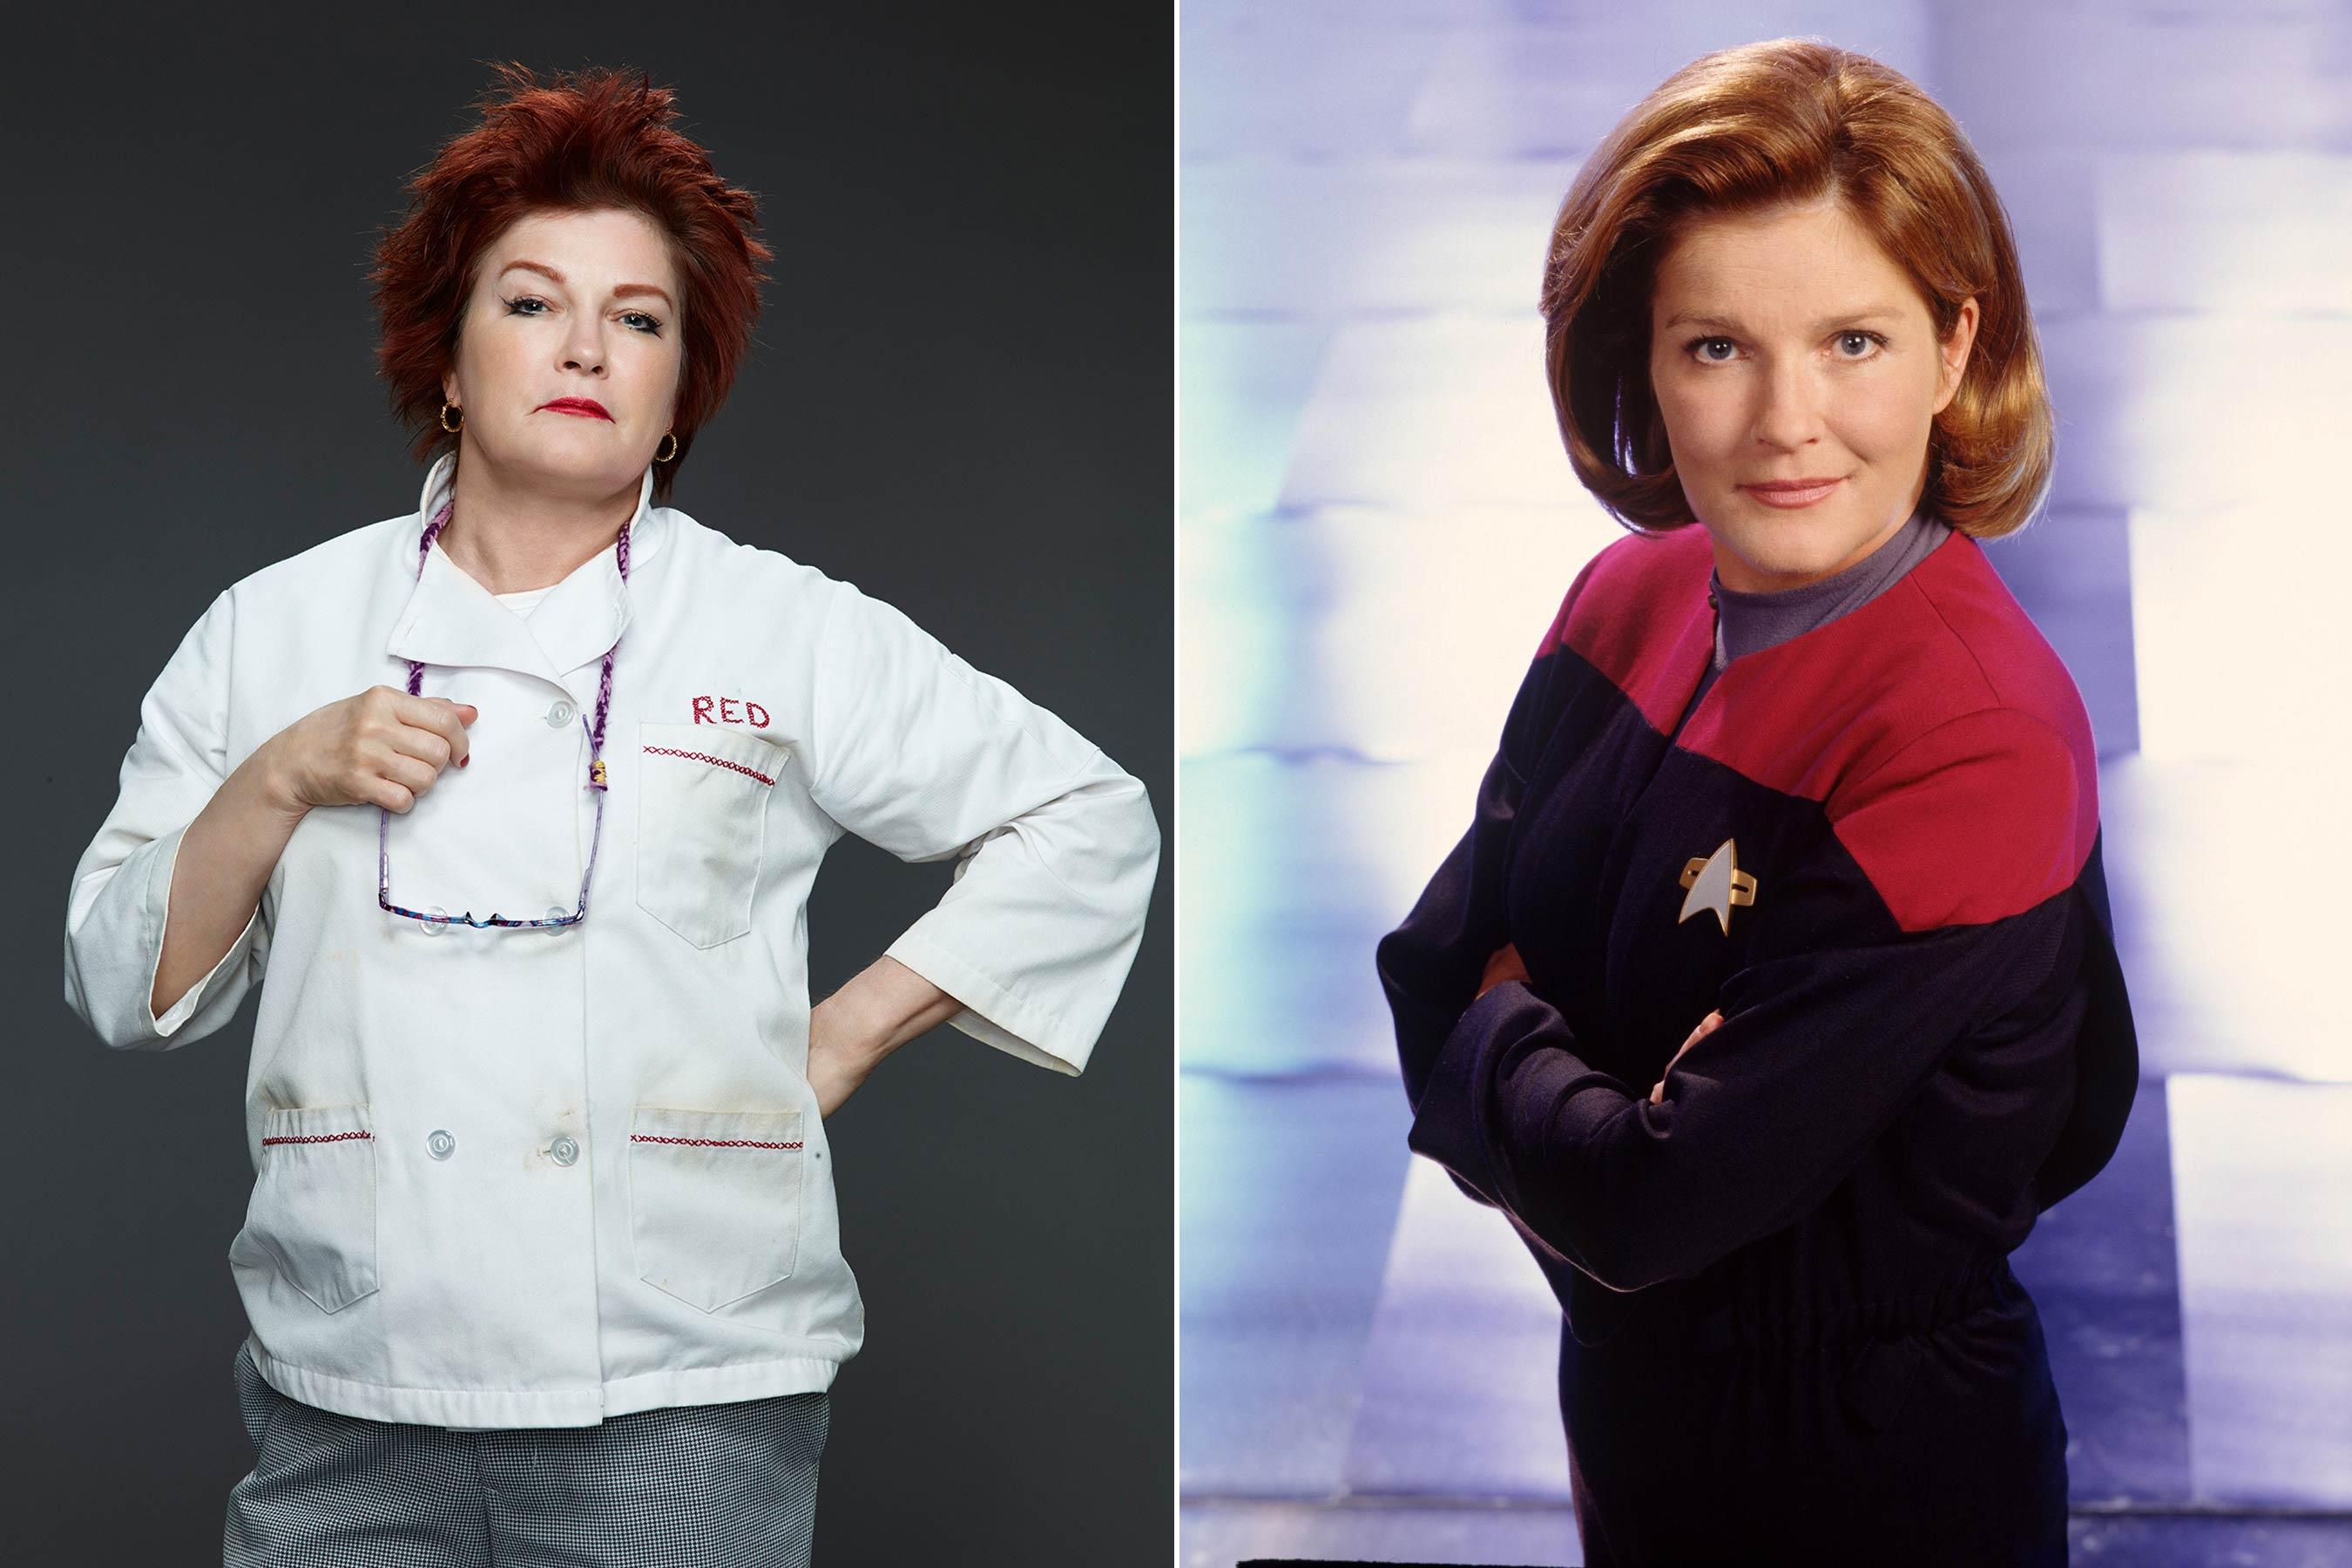 Before Kate Mulgrew played Galina  Red  Reznikov on Orange Is the New Black she starred as Kathryn Janeway on Star Trek: Voyager.